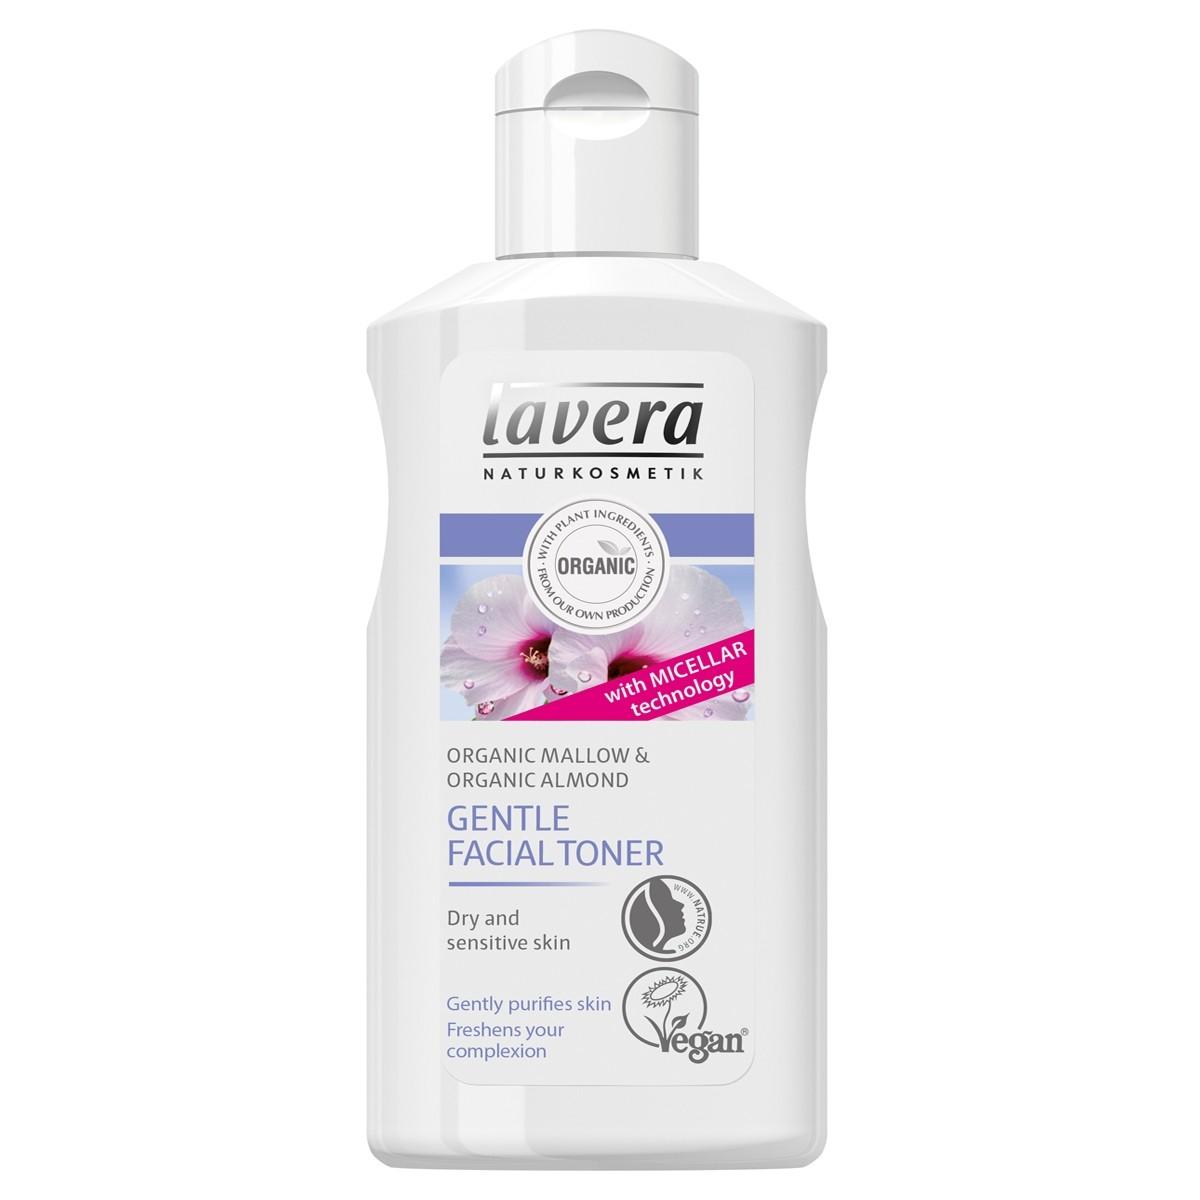 Lavera Organic Gentle Facial Toner